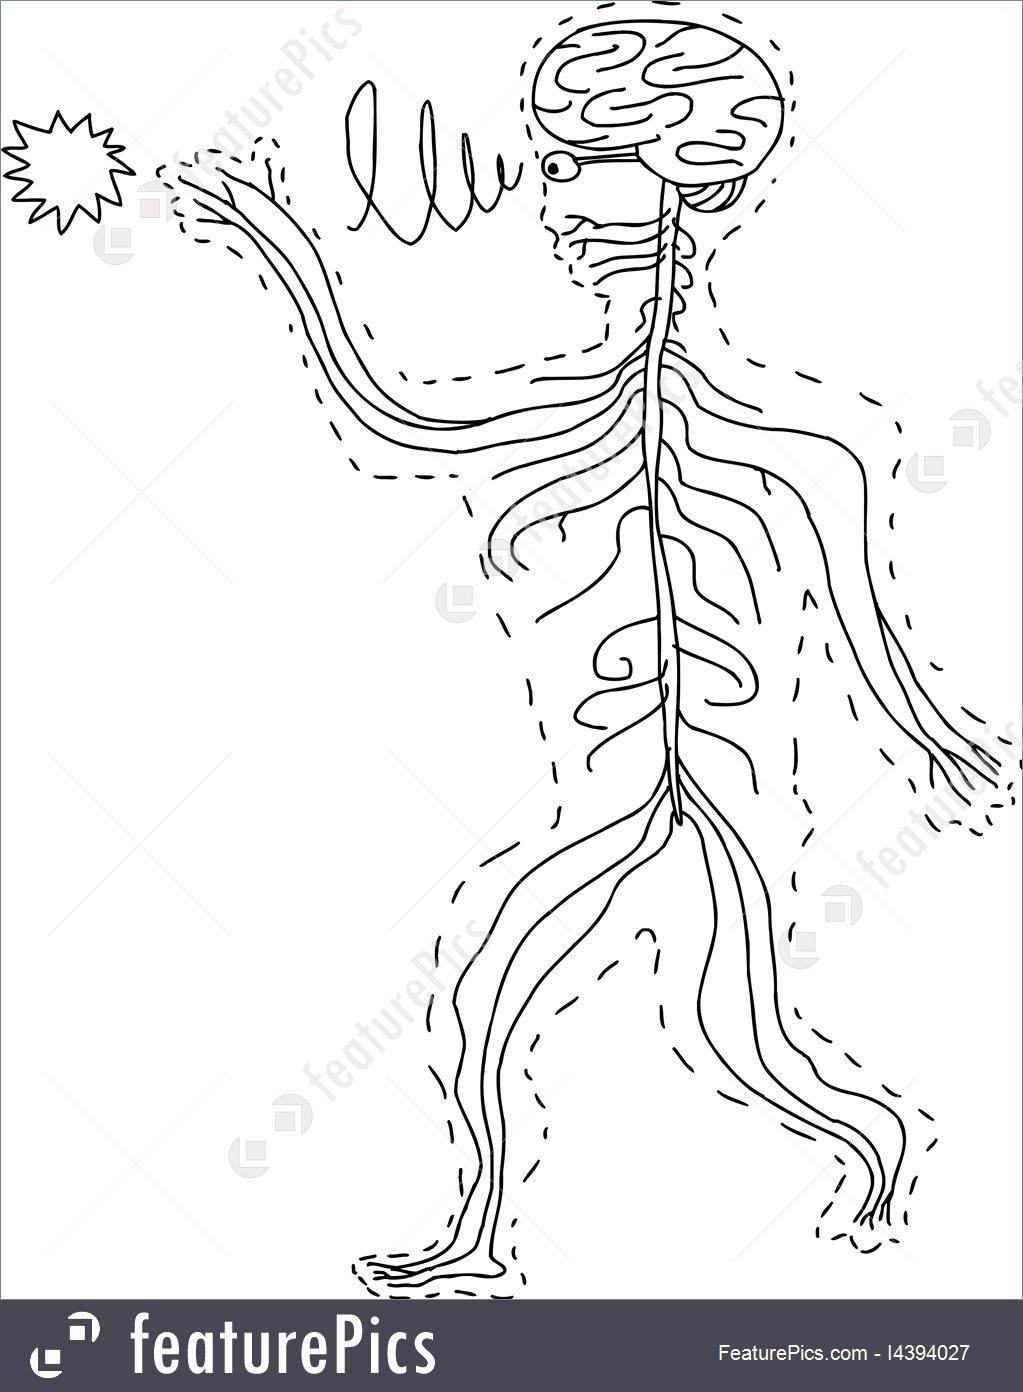 Human Organs Drawing at GetDrawings.com | Free for personal use ...